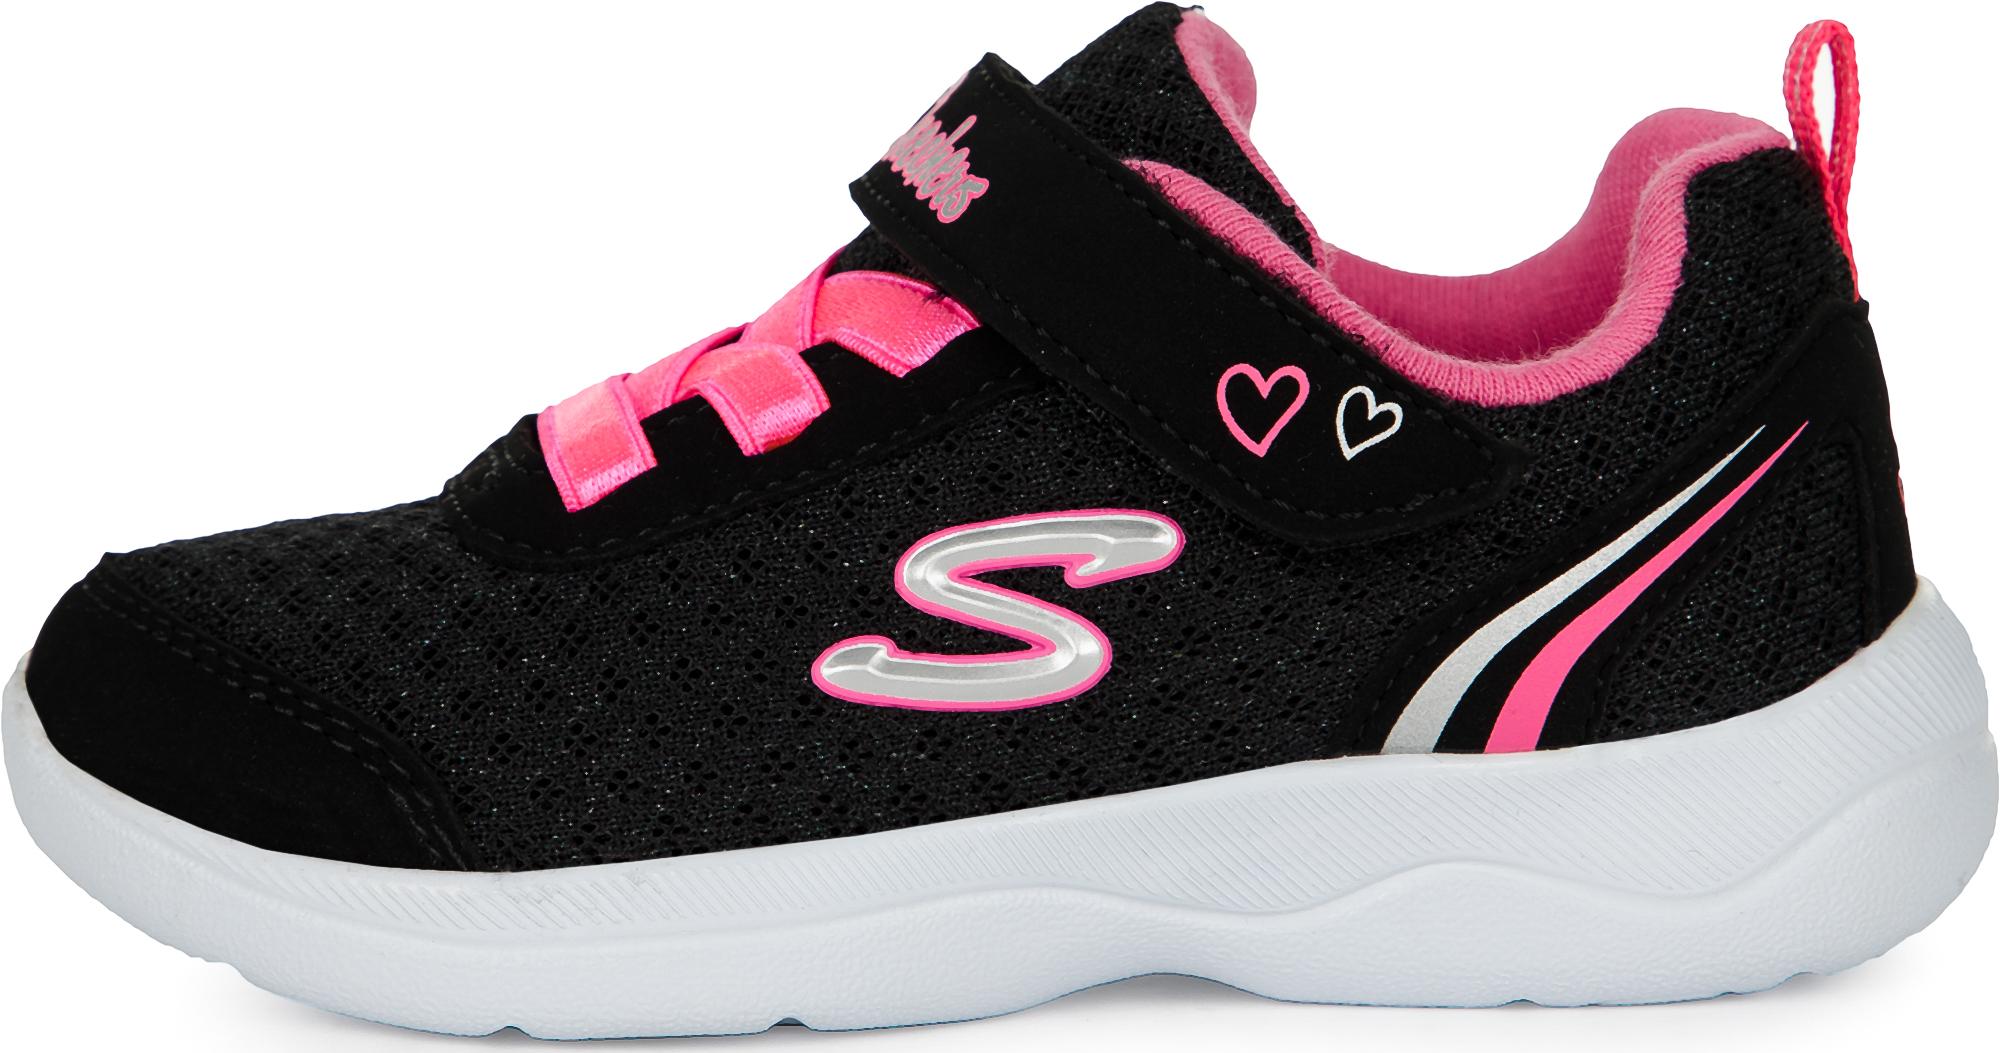 Skechers Кроссовки для девочек Skech-Stepz 2.0-Eyes On You, размер 28,5